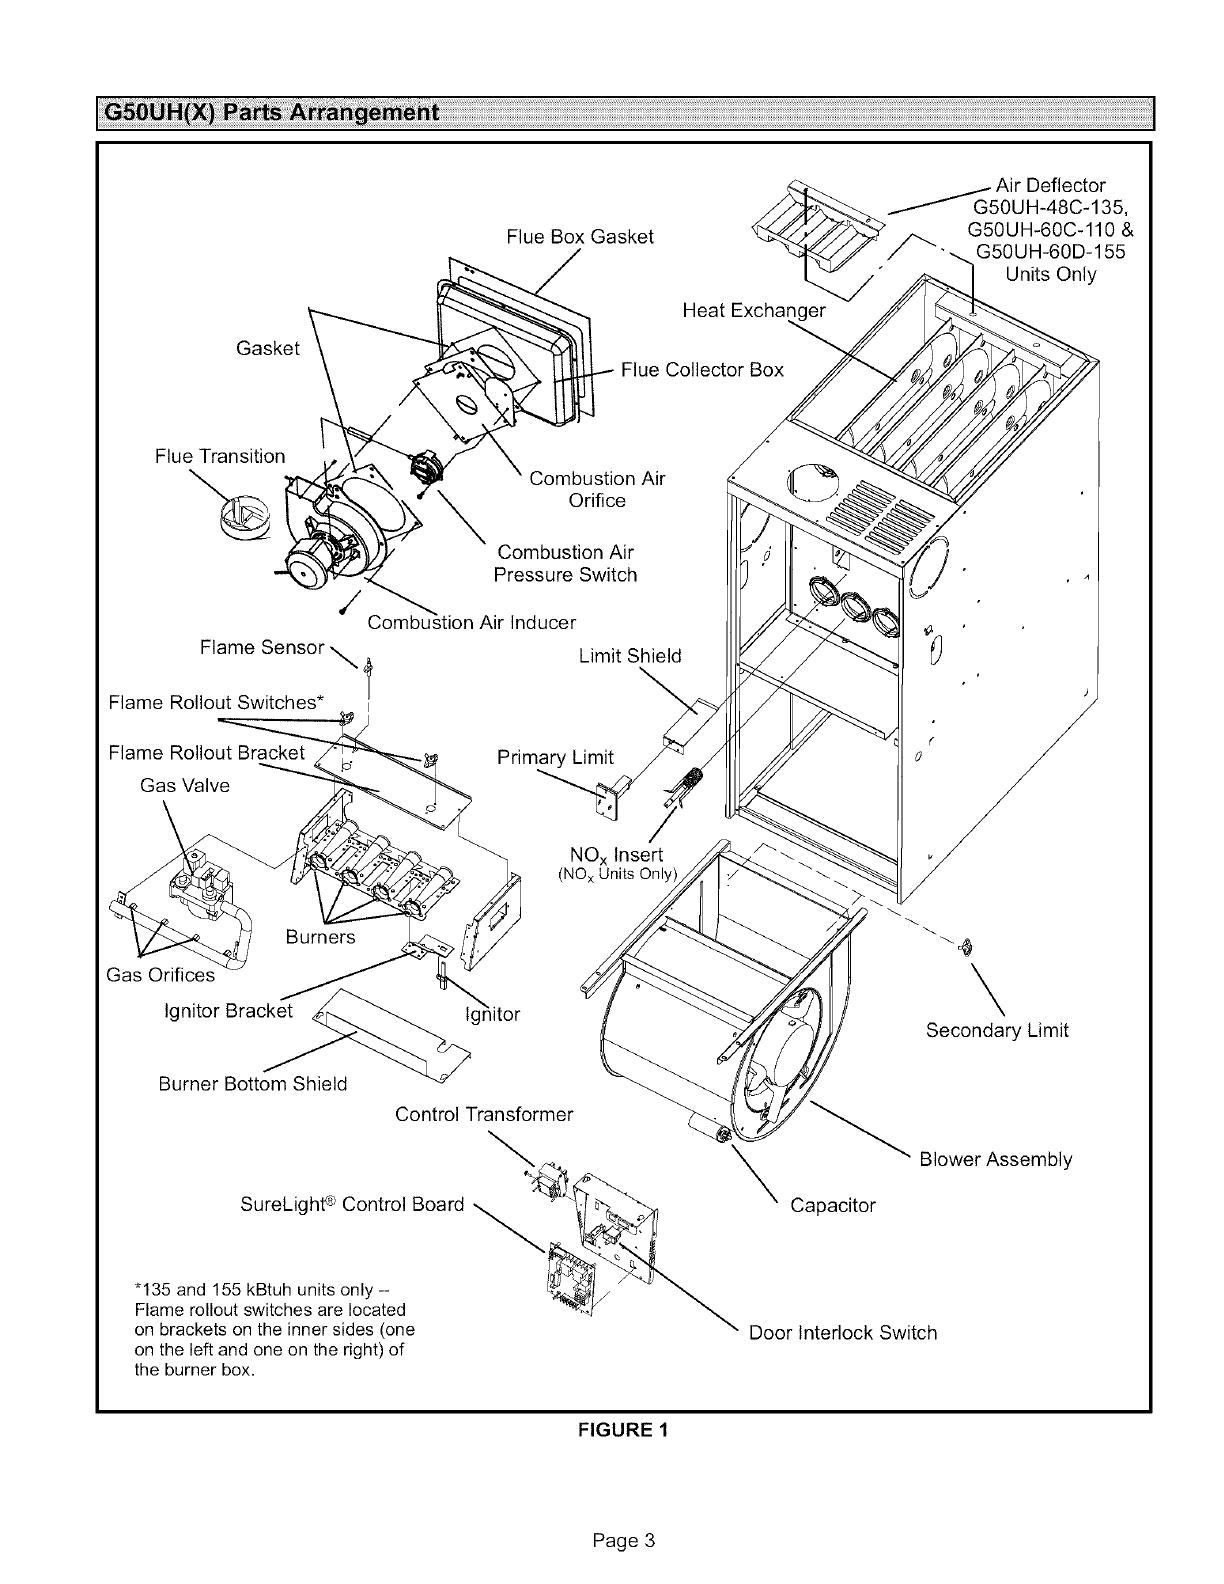 lennox international inc g50uh 24a 045 users manual Tempstar Furnace Blower Motor Replacement